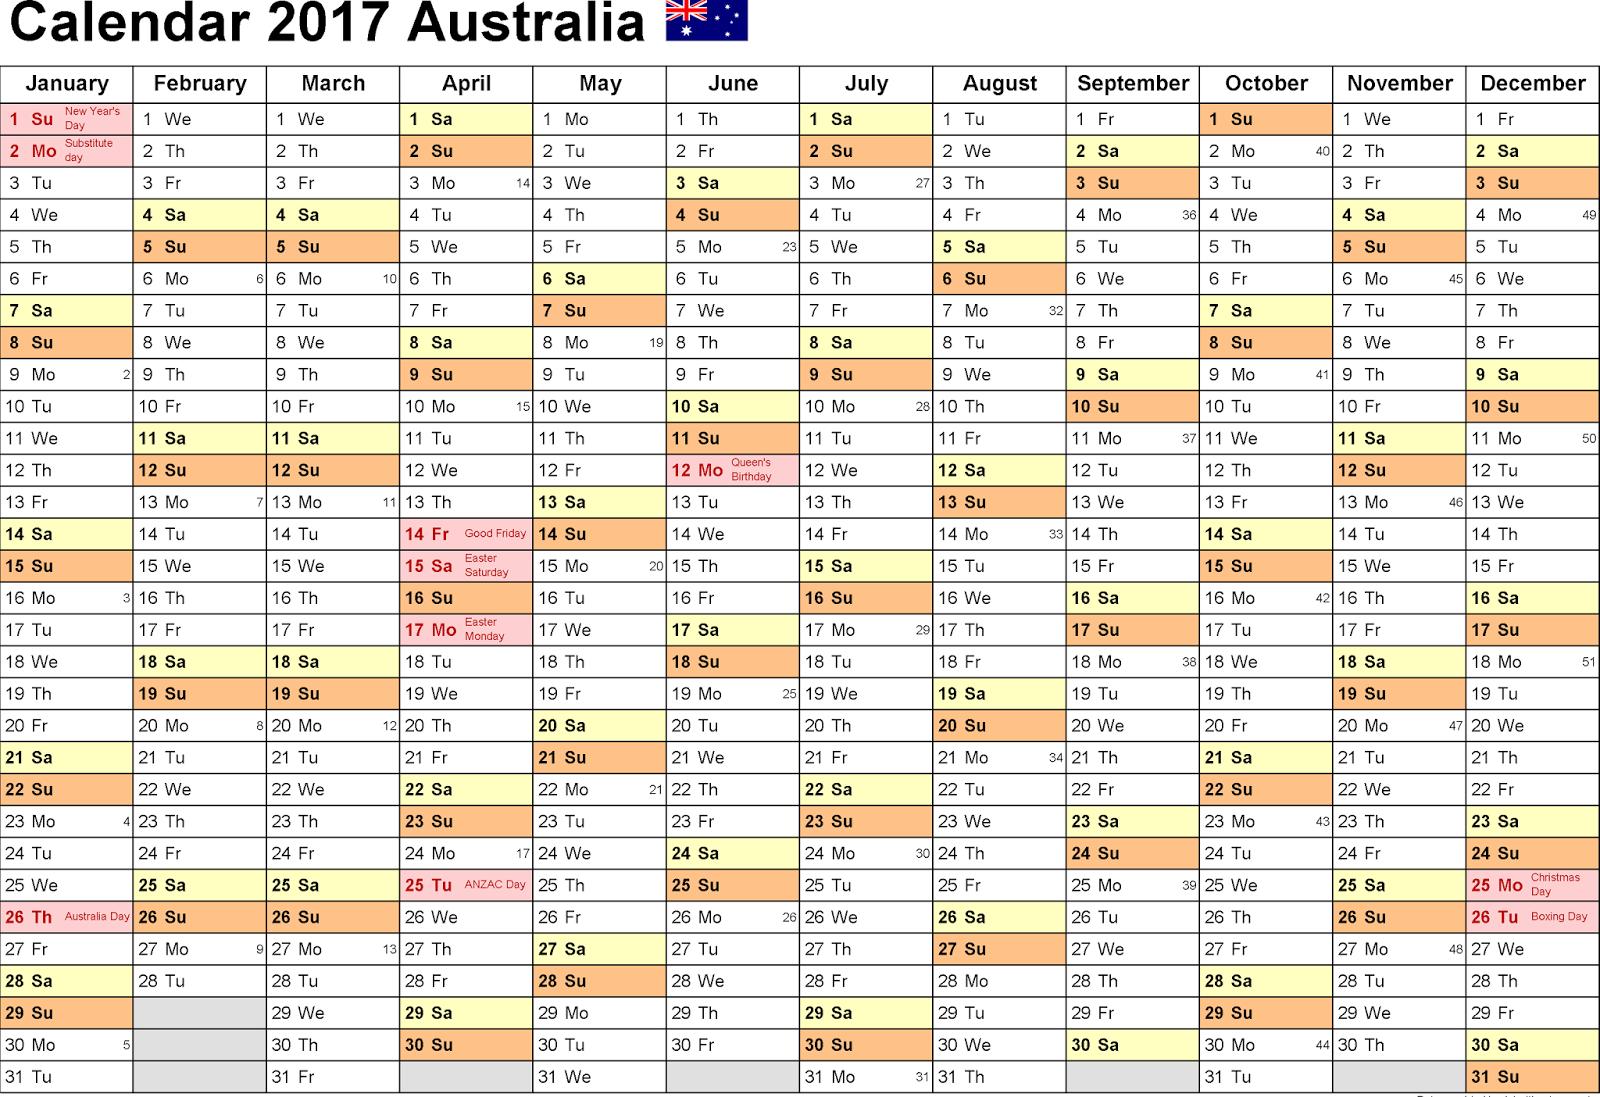 photo calendar australia